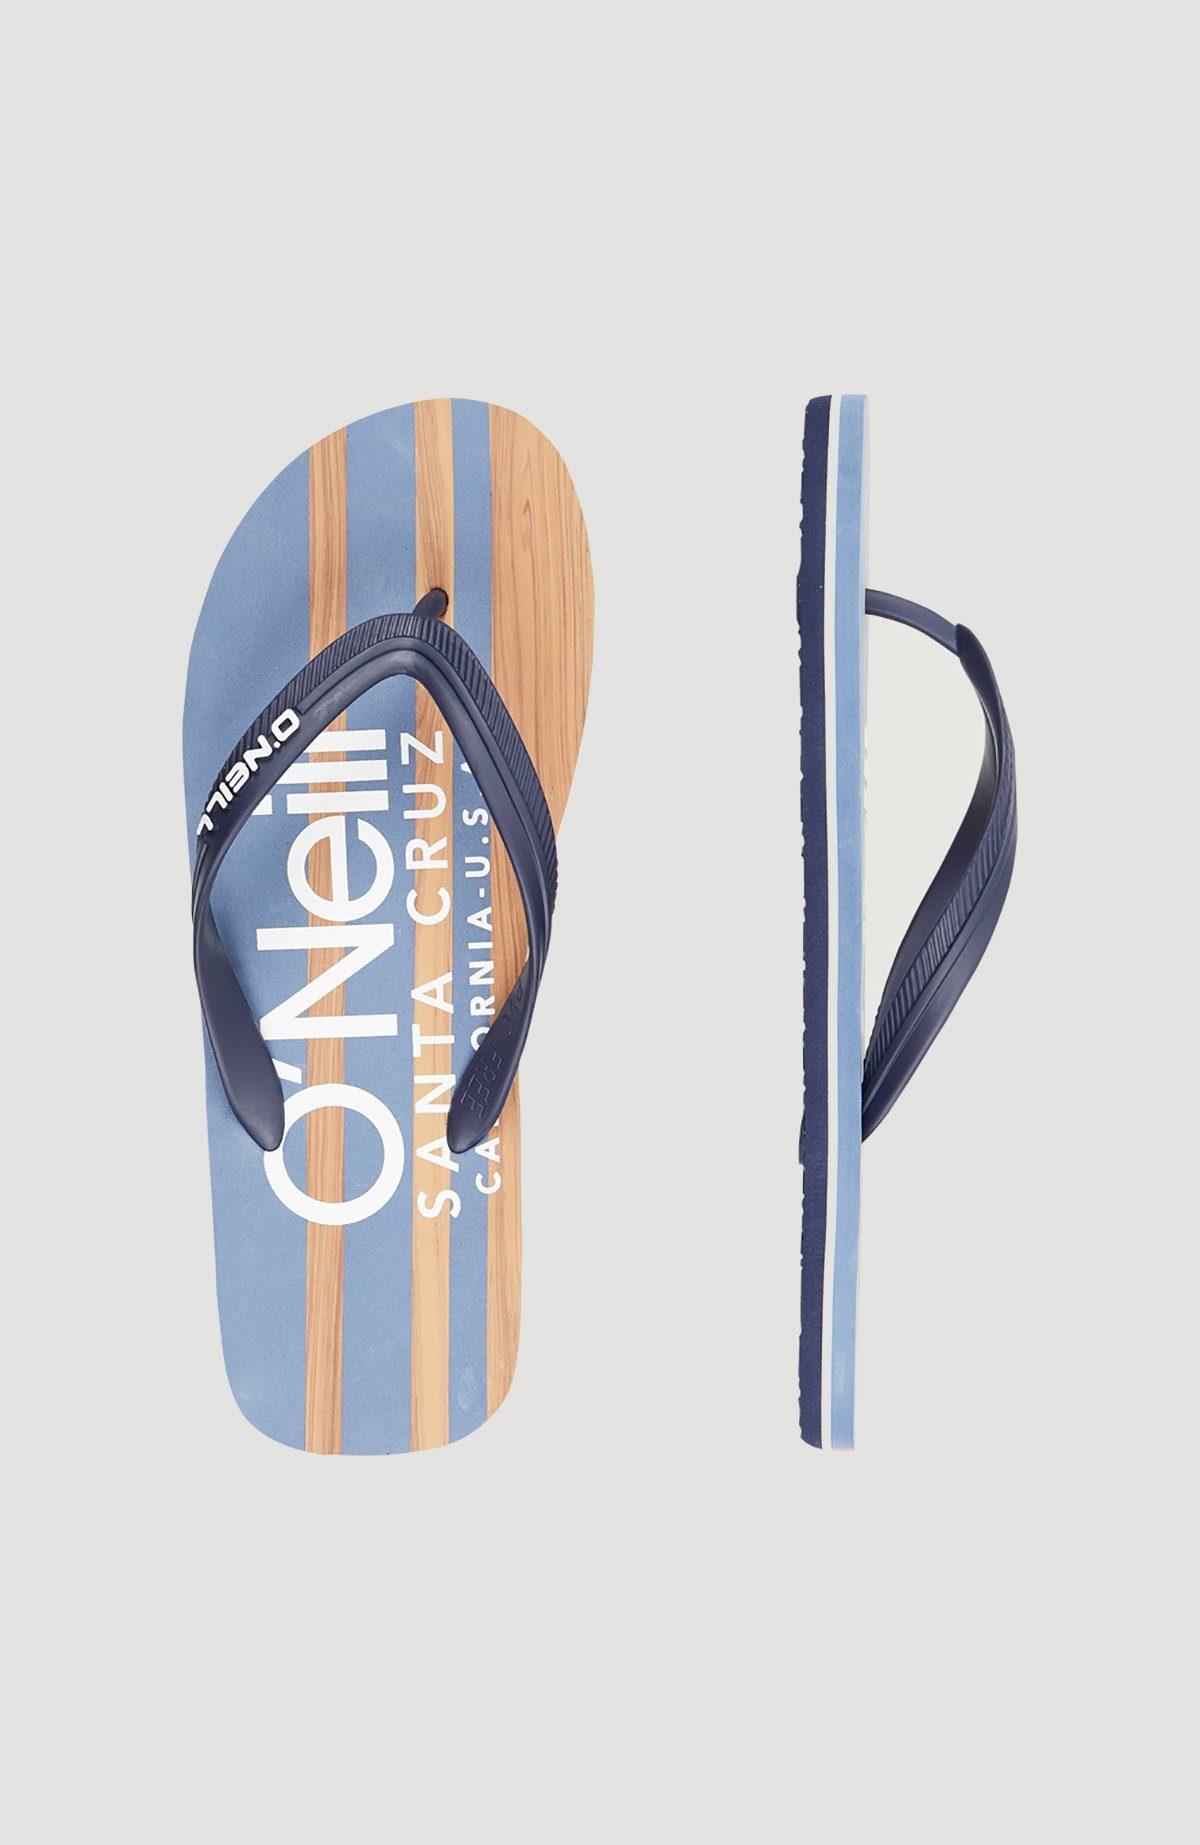 O'neill Sandalen Profile Cali Wood Makkelijk Gevonden - Geweldige Prijs